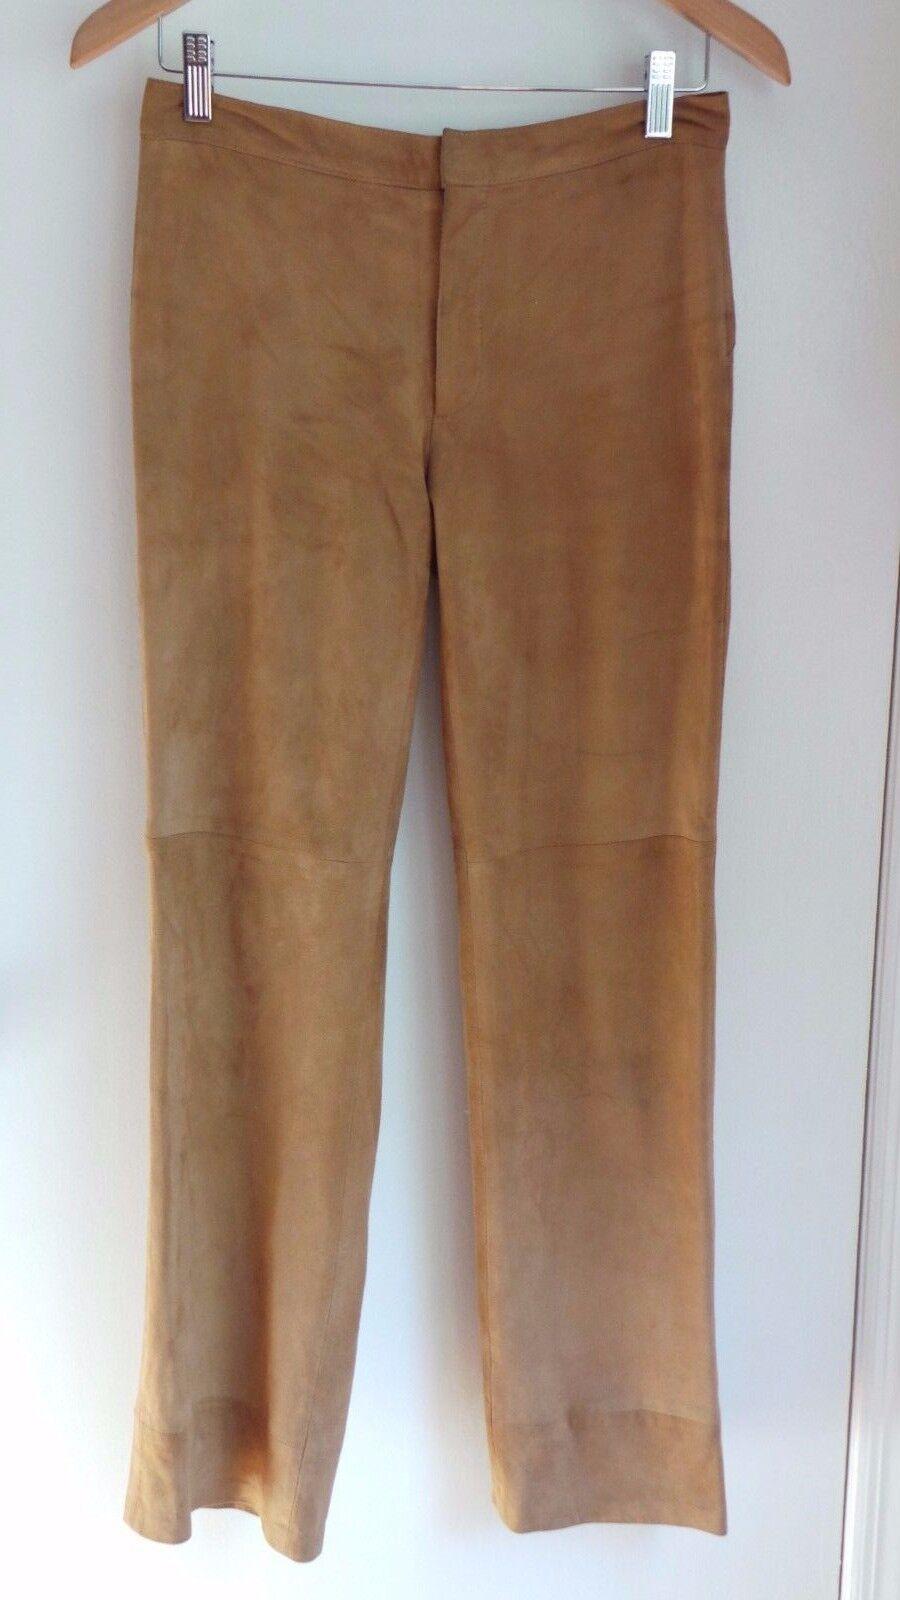 SUEDE PANTS tan light brown BRUUNS BAZAAR tan Goatskin Euro Sz 36 US 4-6 Lined